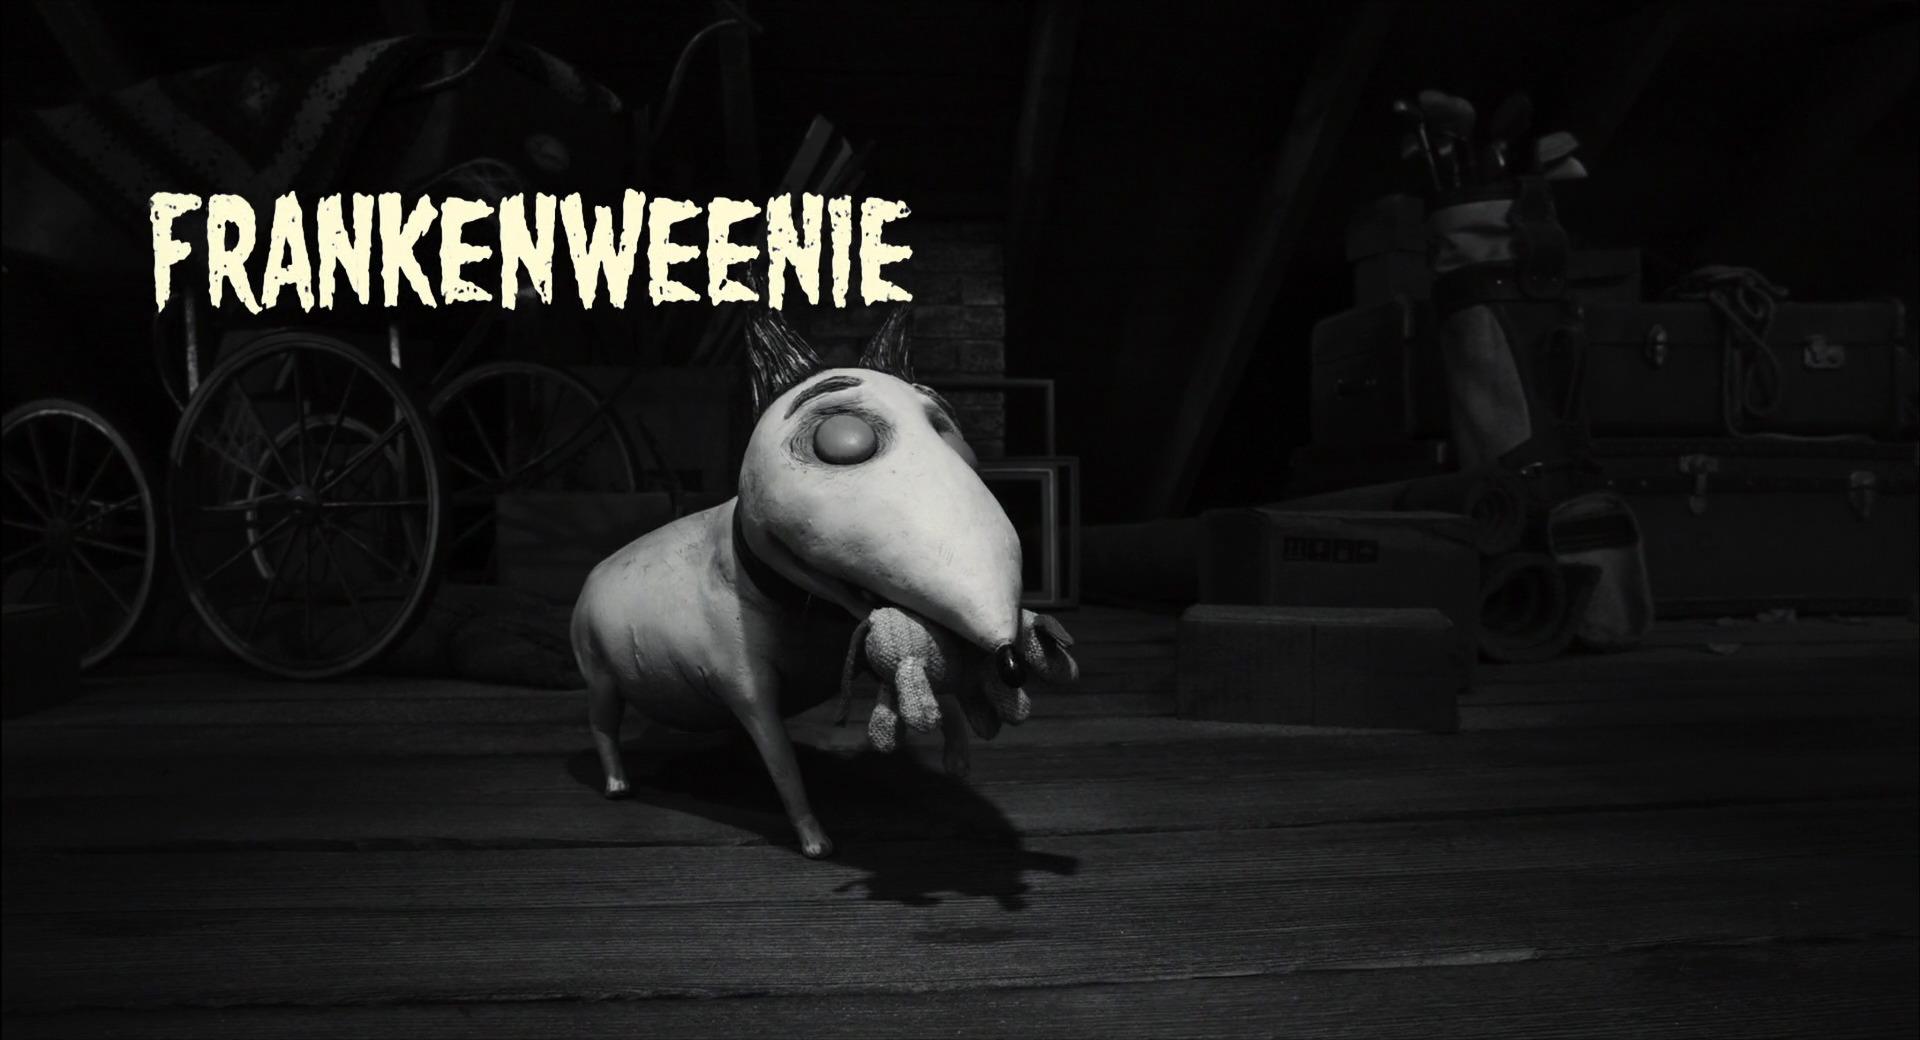 Frankenweenie 2012 Animation Screencaps